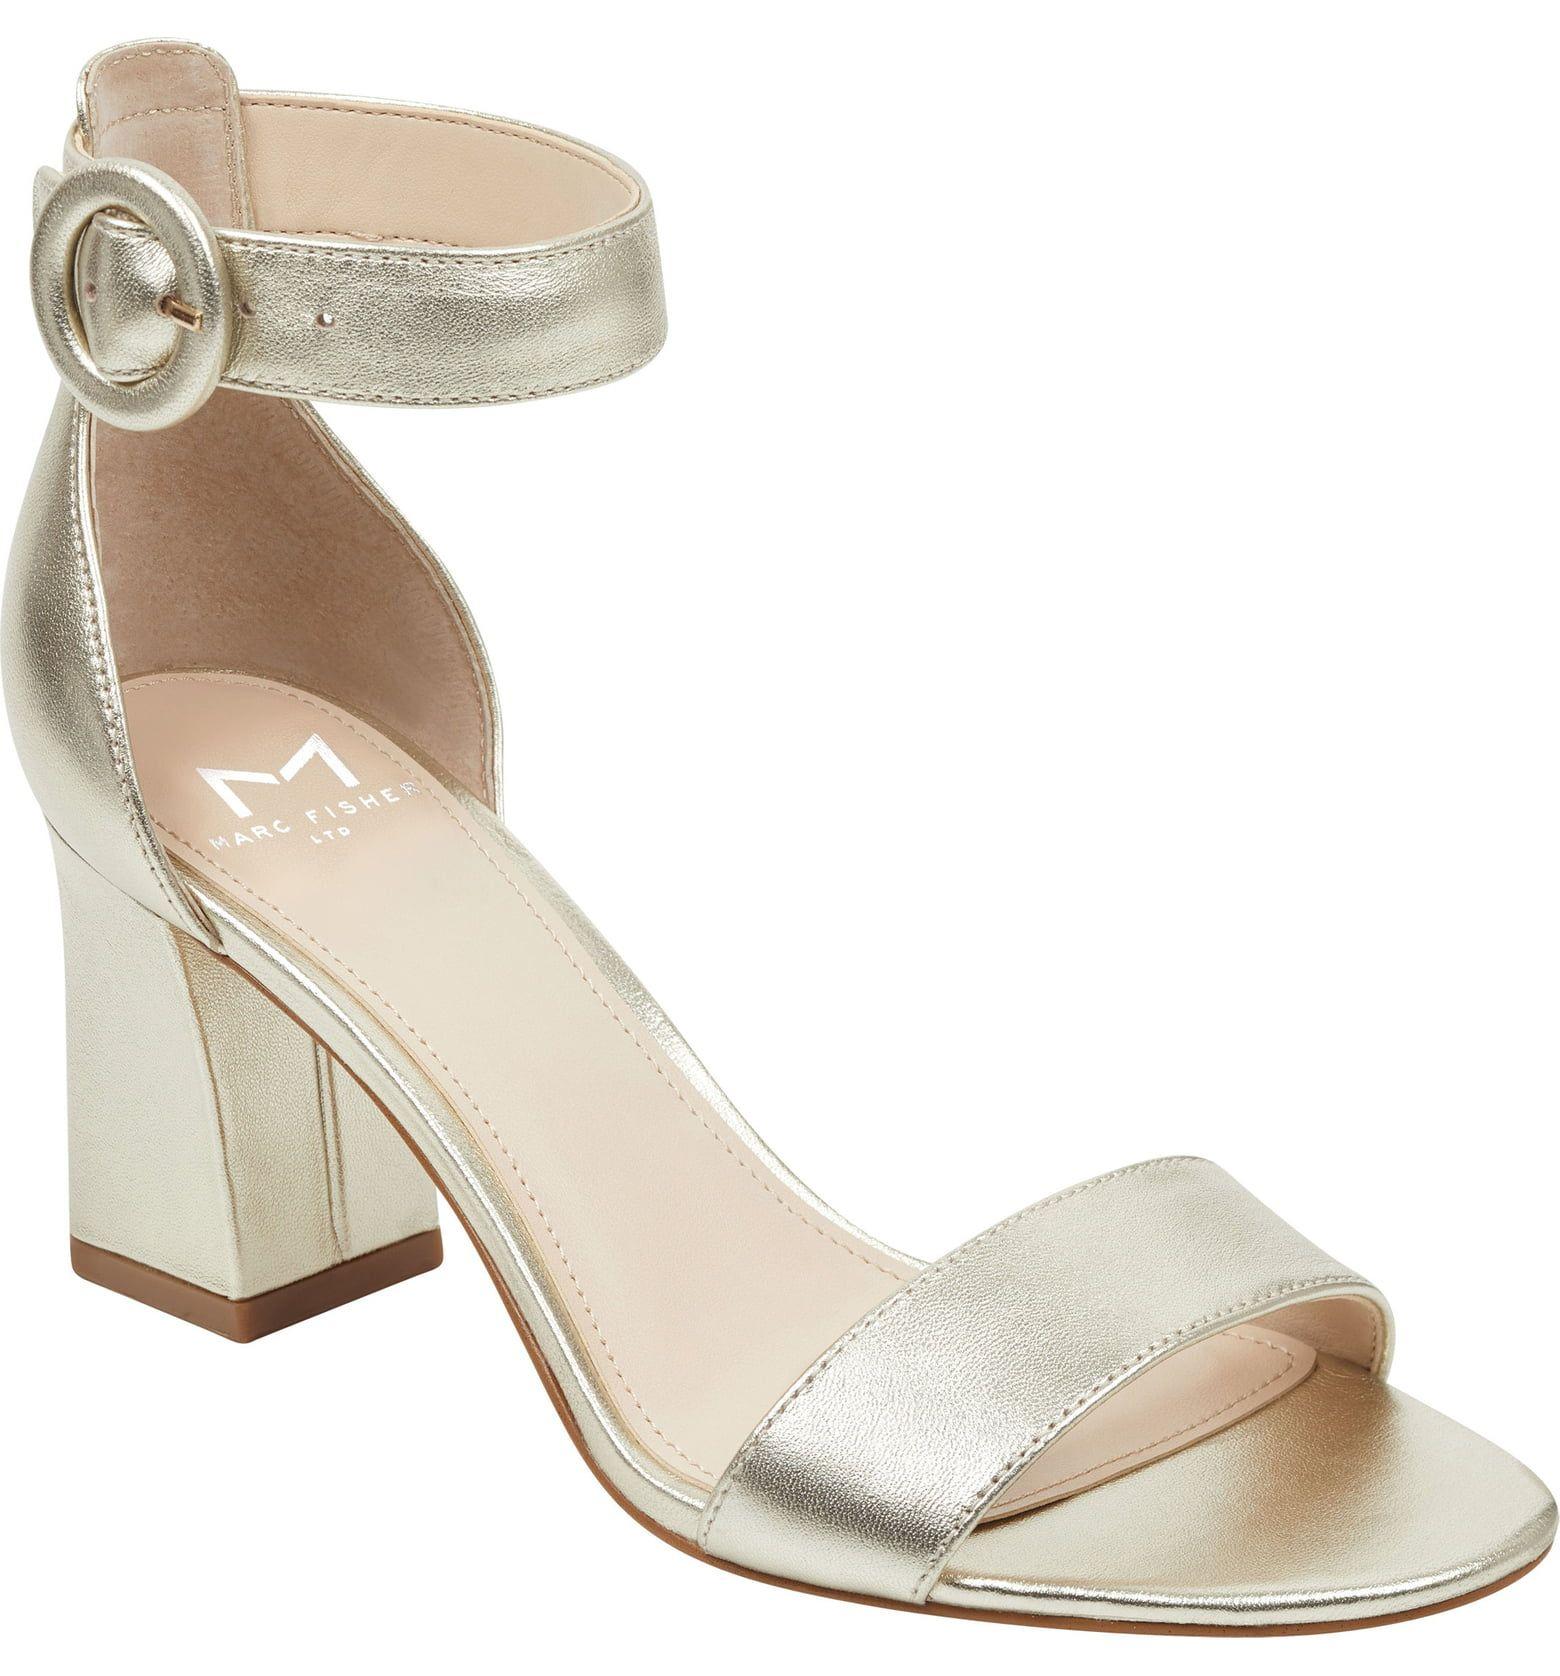 1ae6f9a32 Marc Fisher LTD Karlee Ankle Strap Sandal (Women)